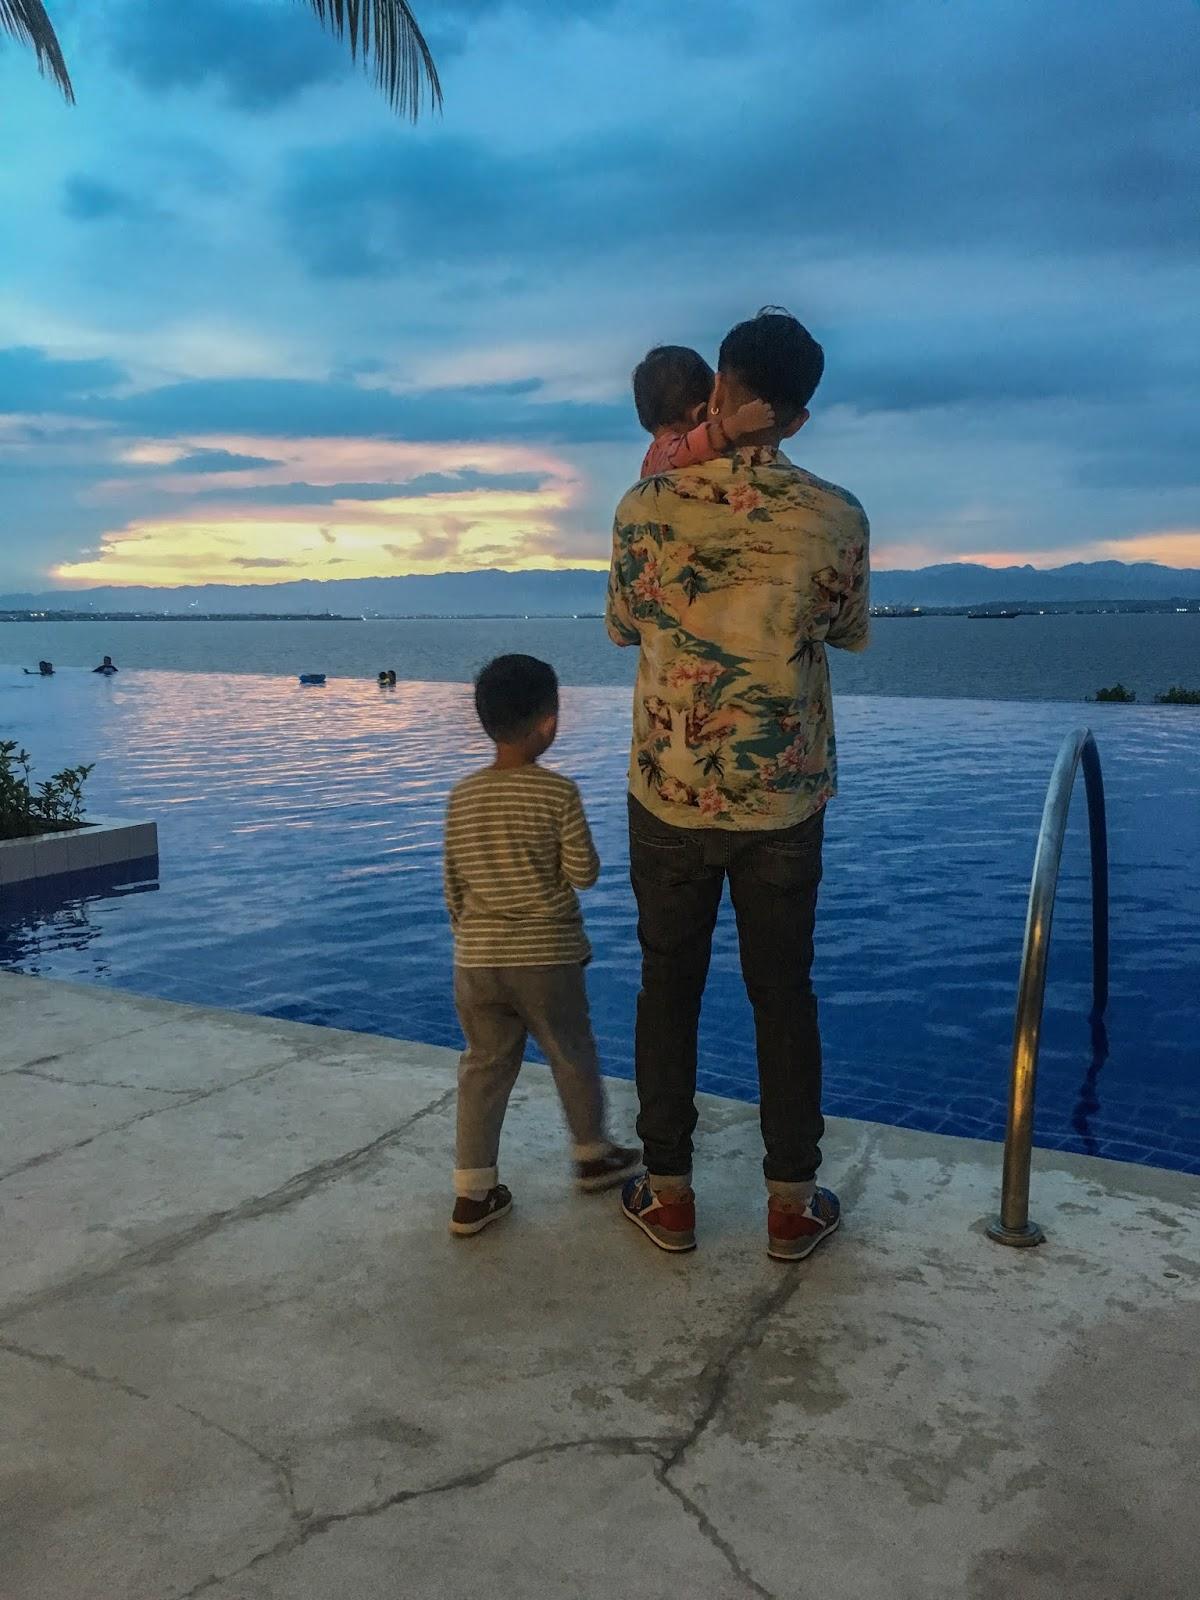 Dusit Thani Mactan sunset view